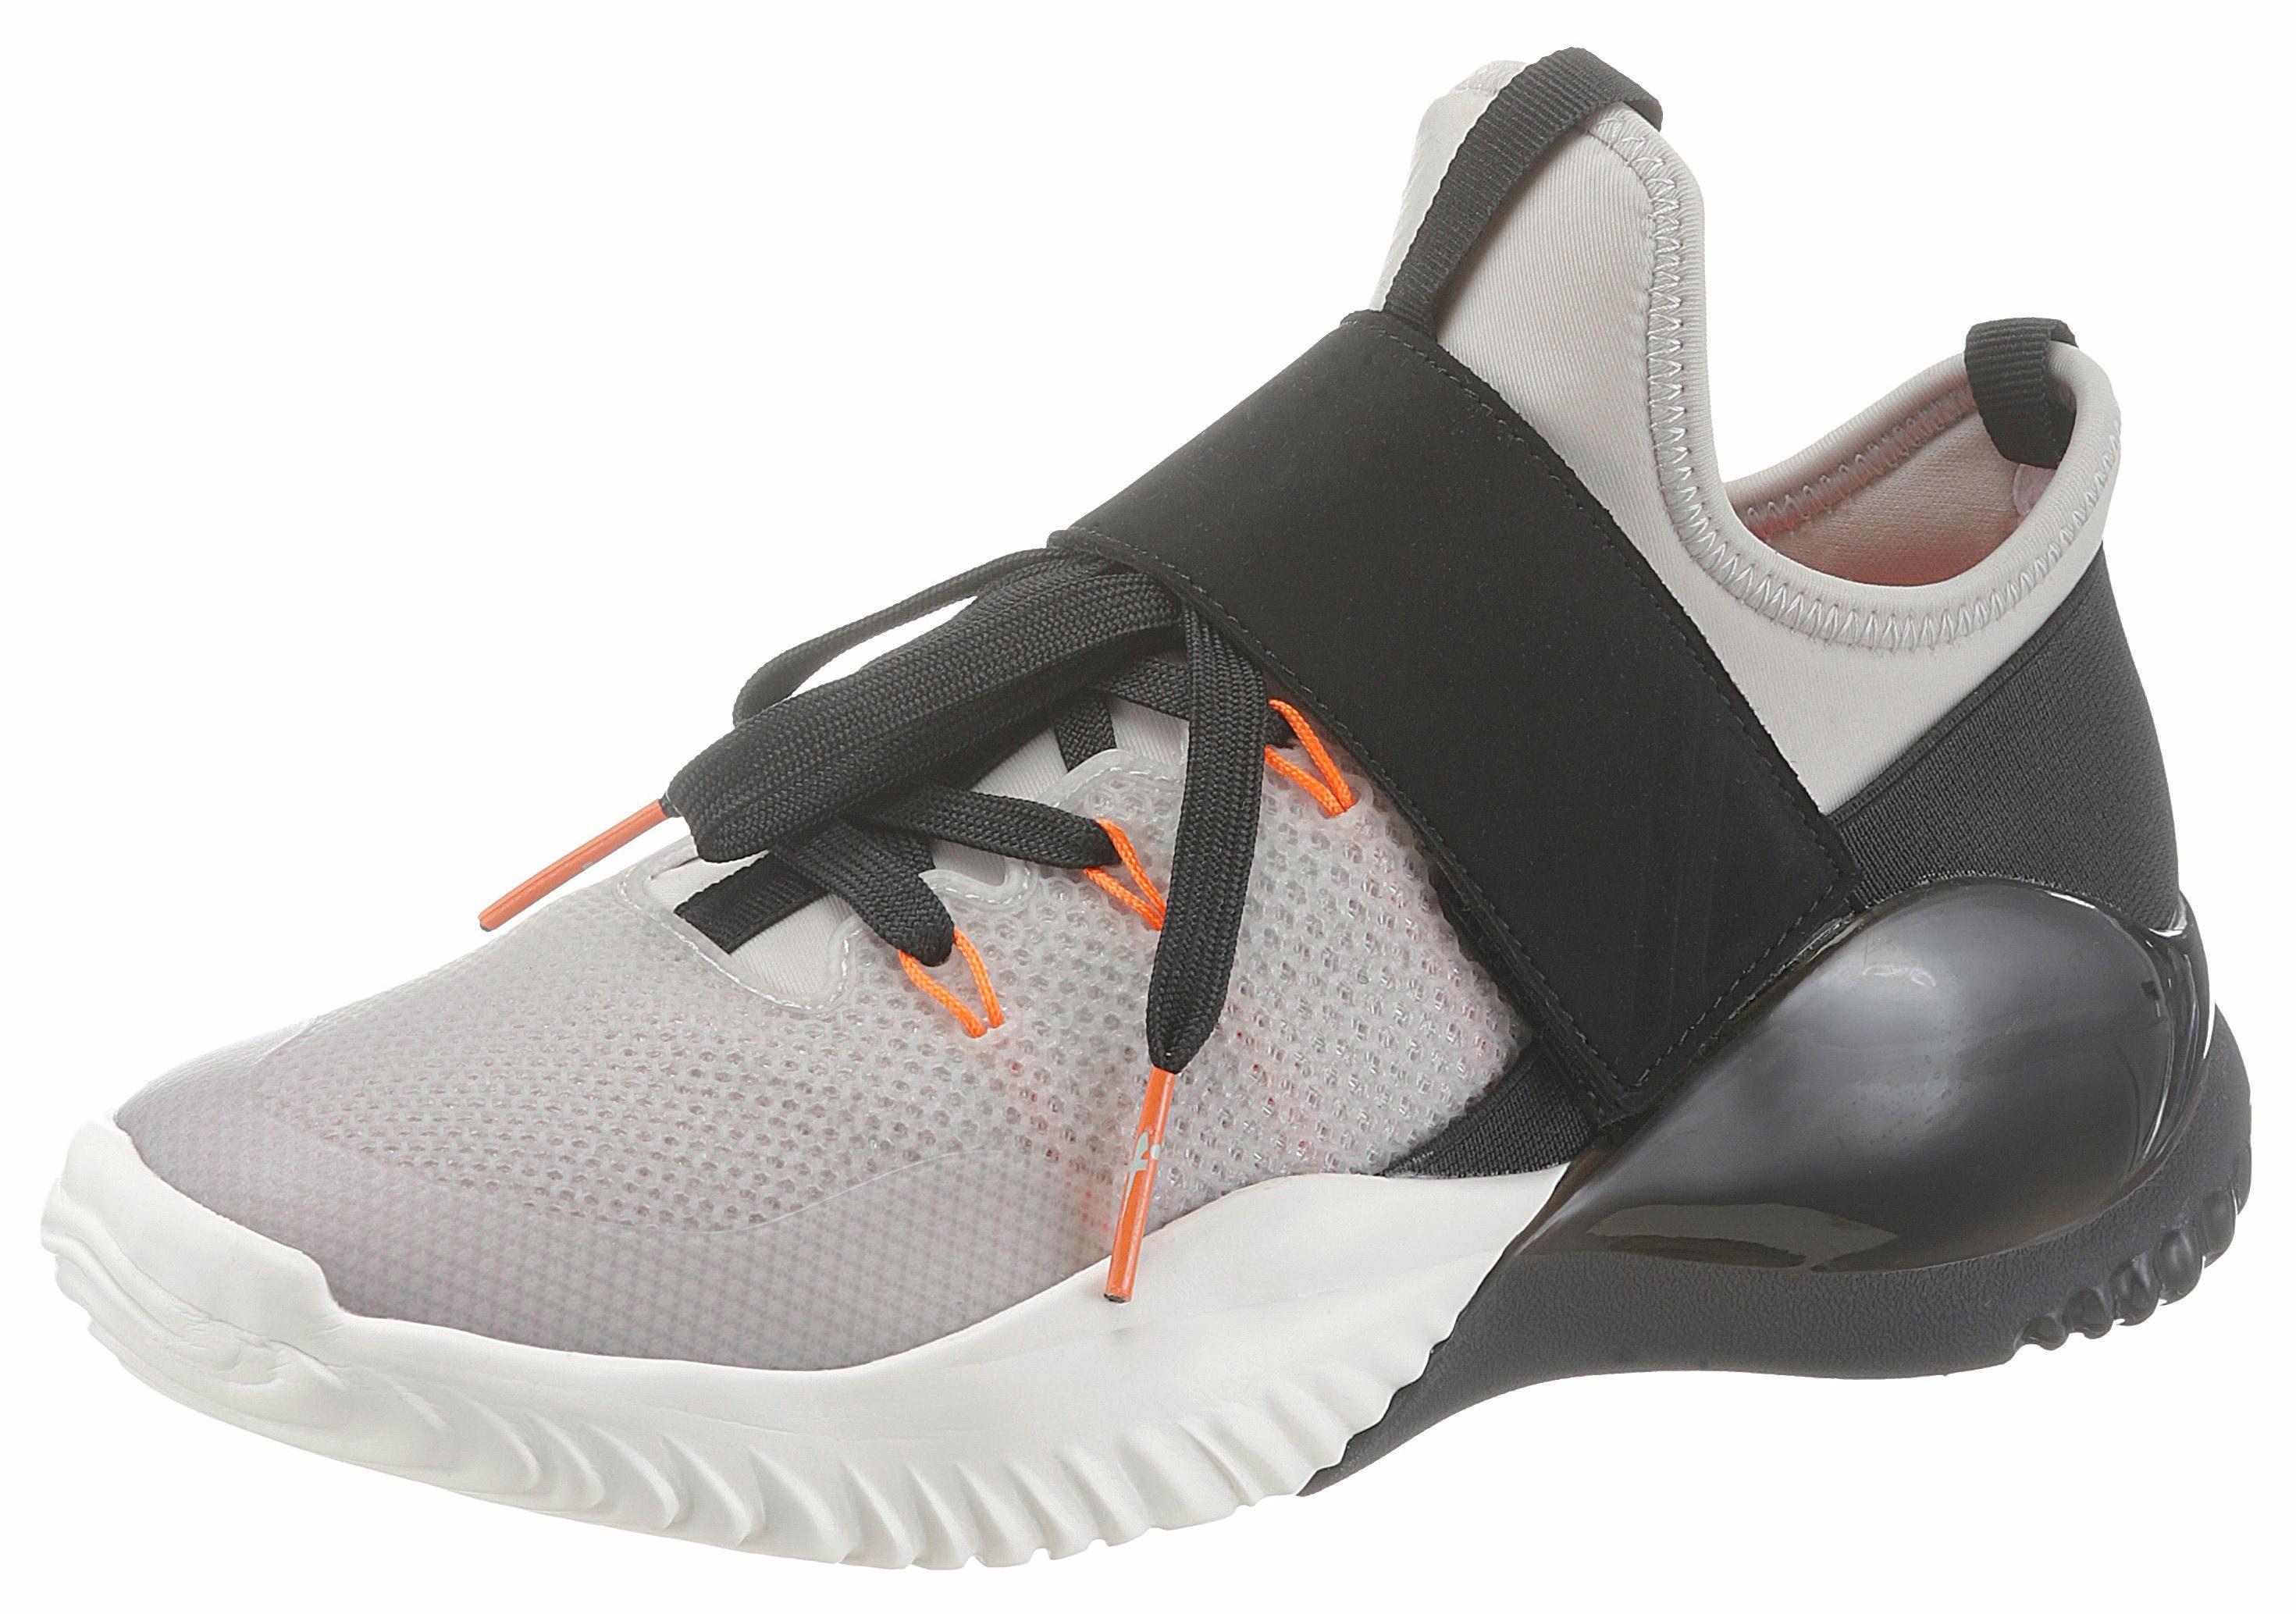 Tamaris Fashletics Sneaker, im trendigen Design  grau-schwarz